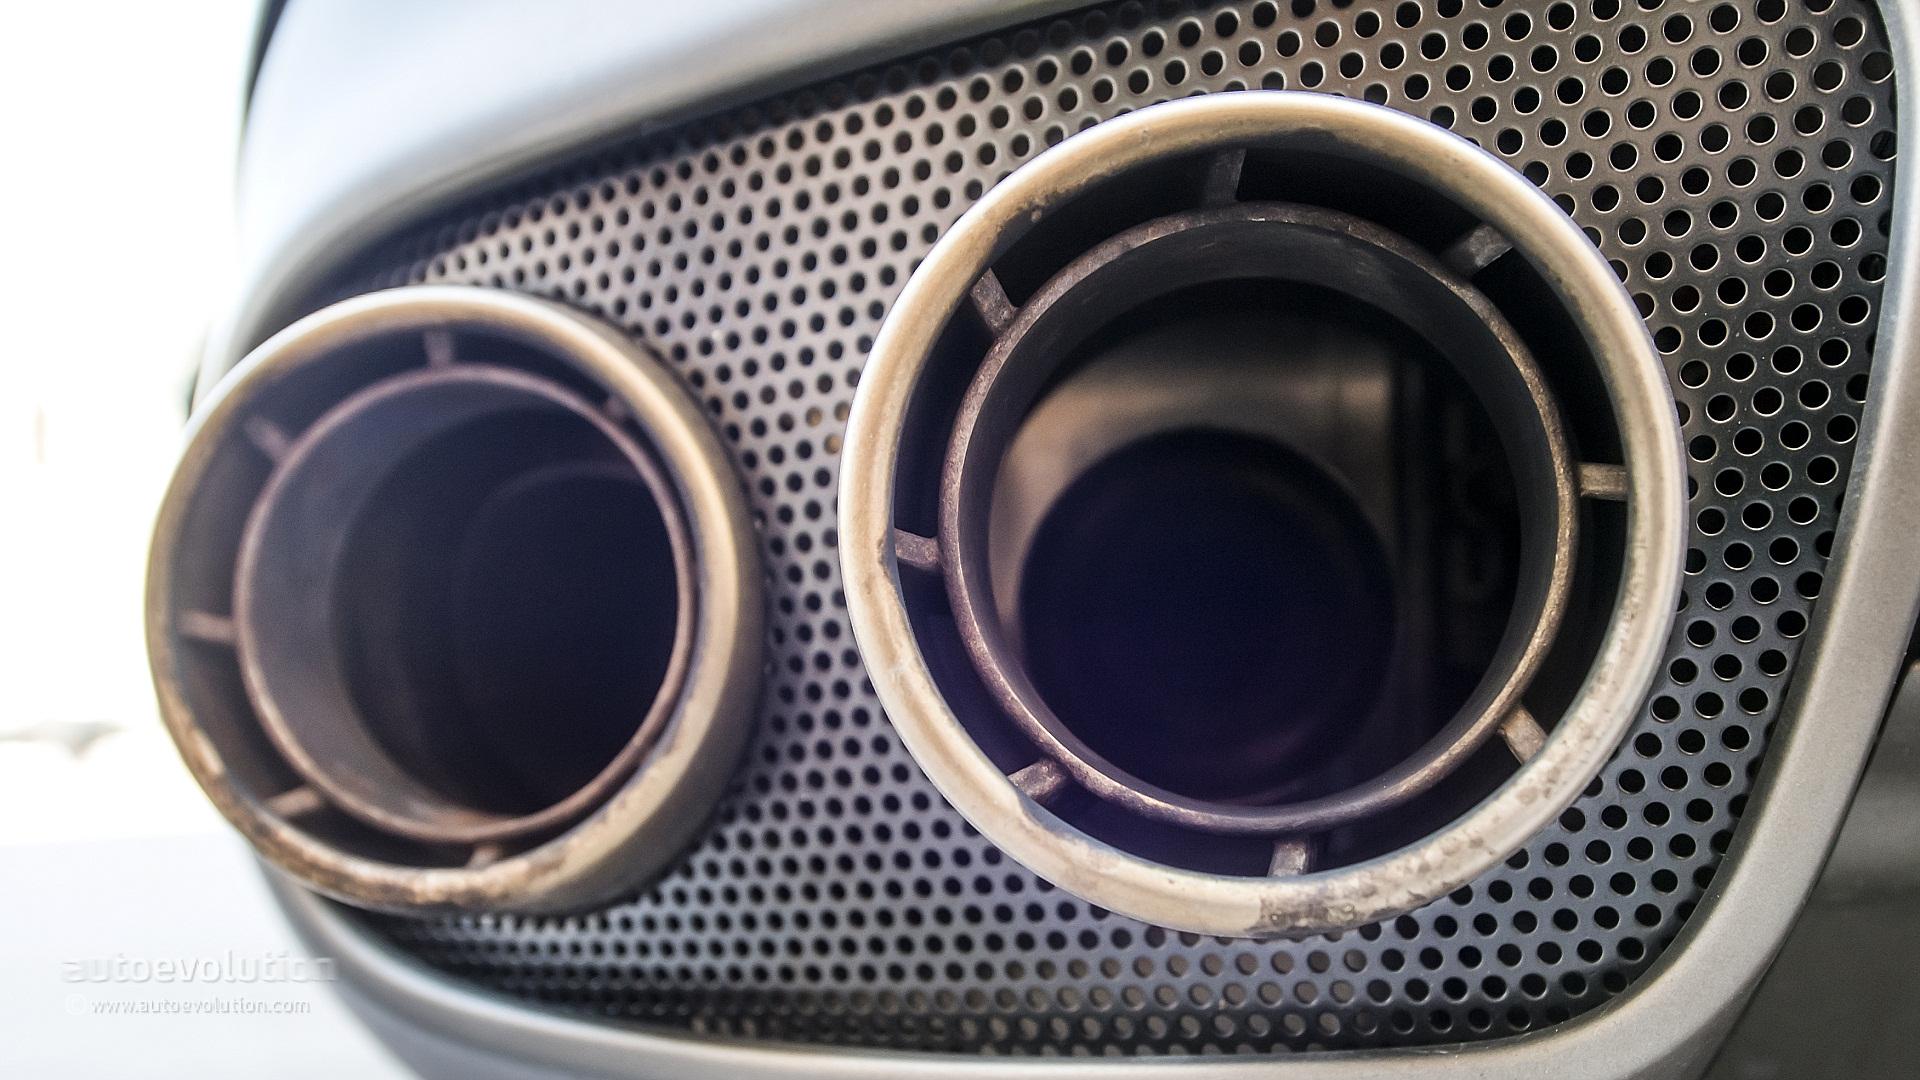 2014-ferrari-f12-berlinetta-exhaust-burns-literally_1.jpg?1381909595